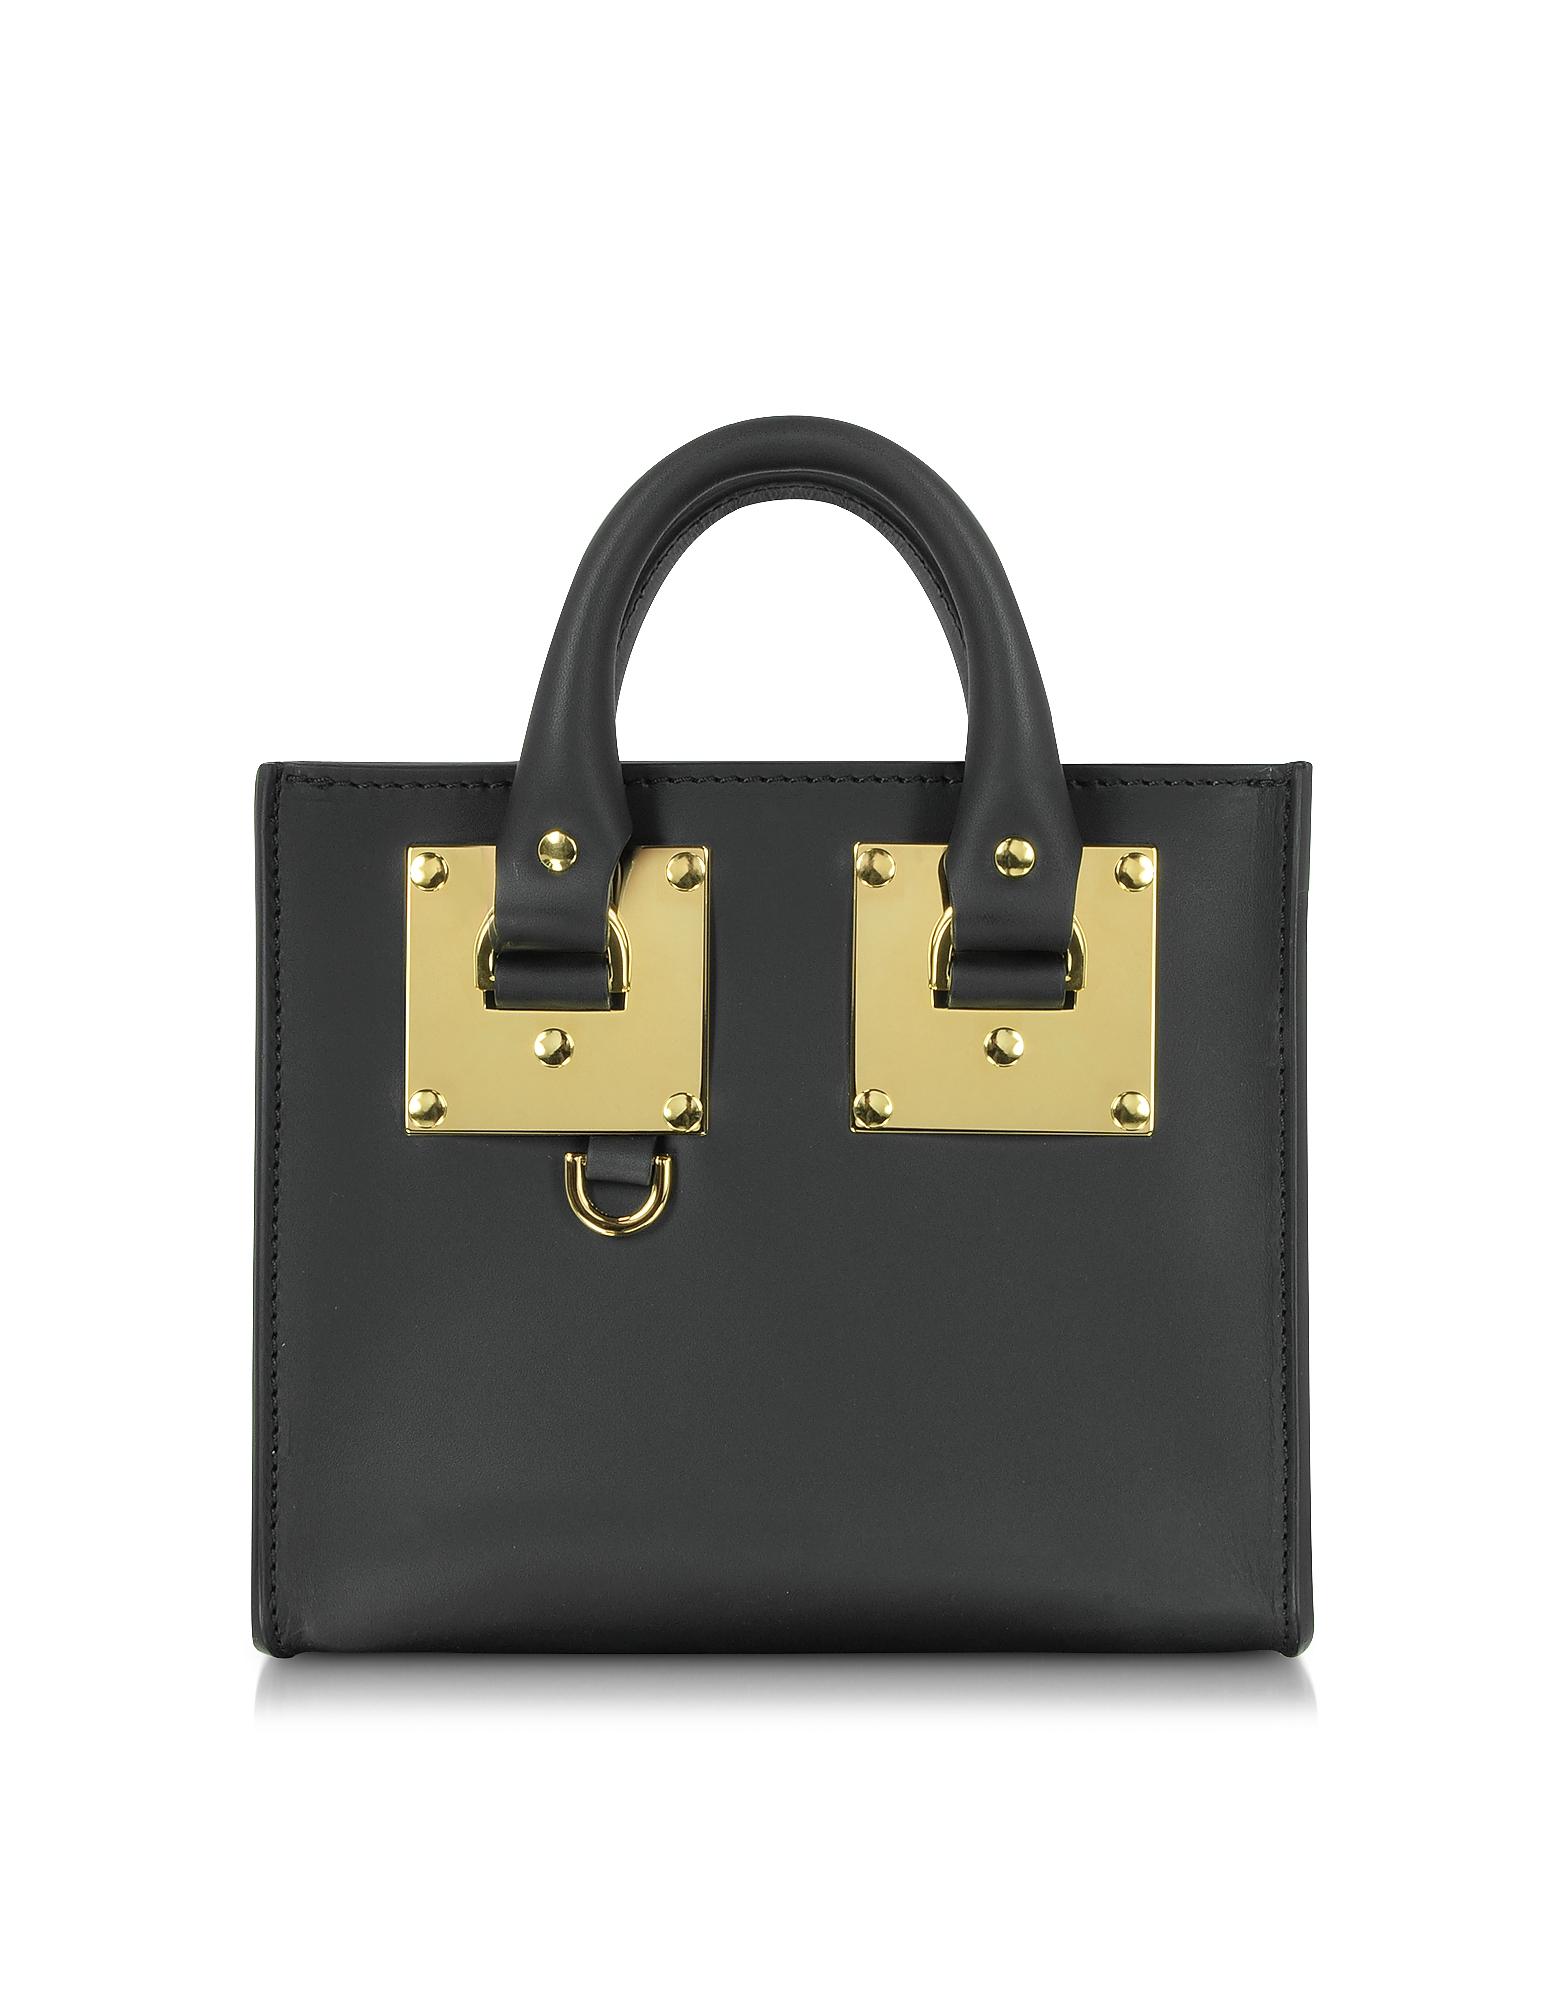 Sophie Hulme Handbags, Black Saddle Leather Albion Box Tote Bag